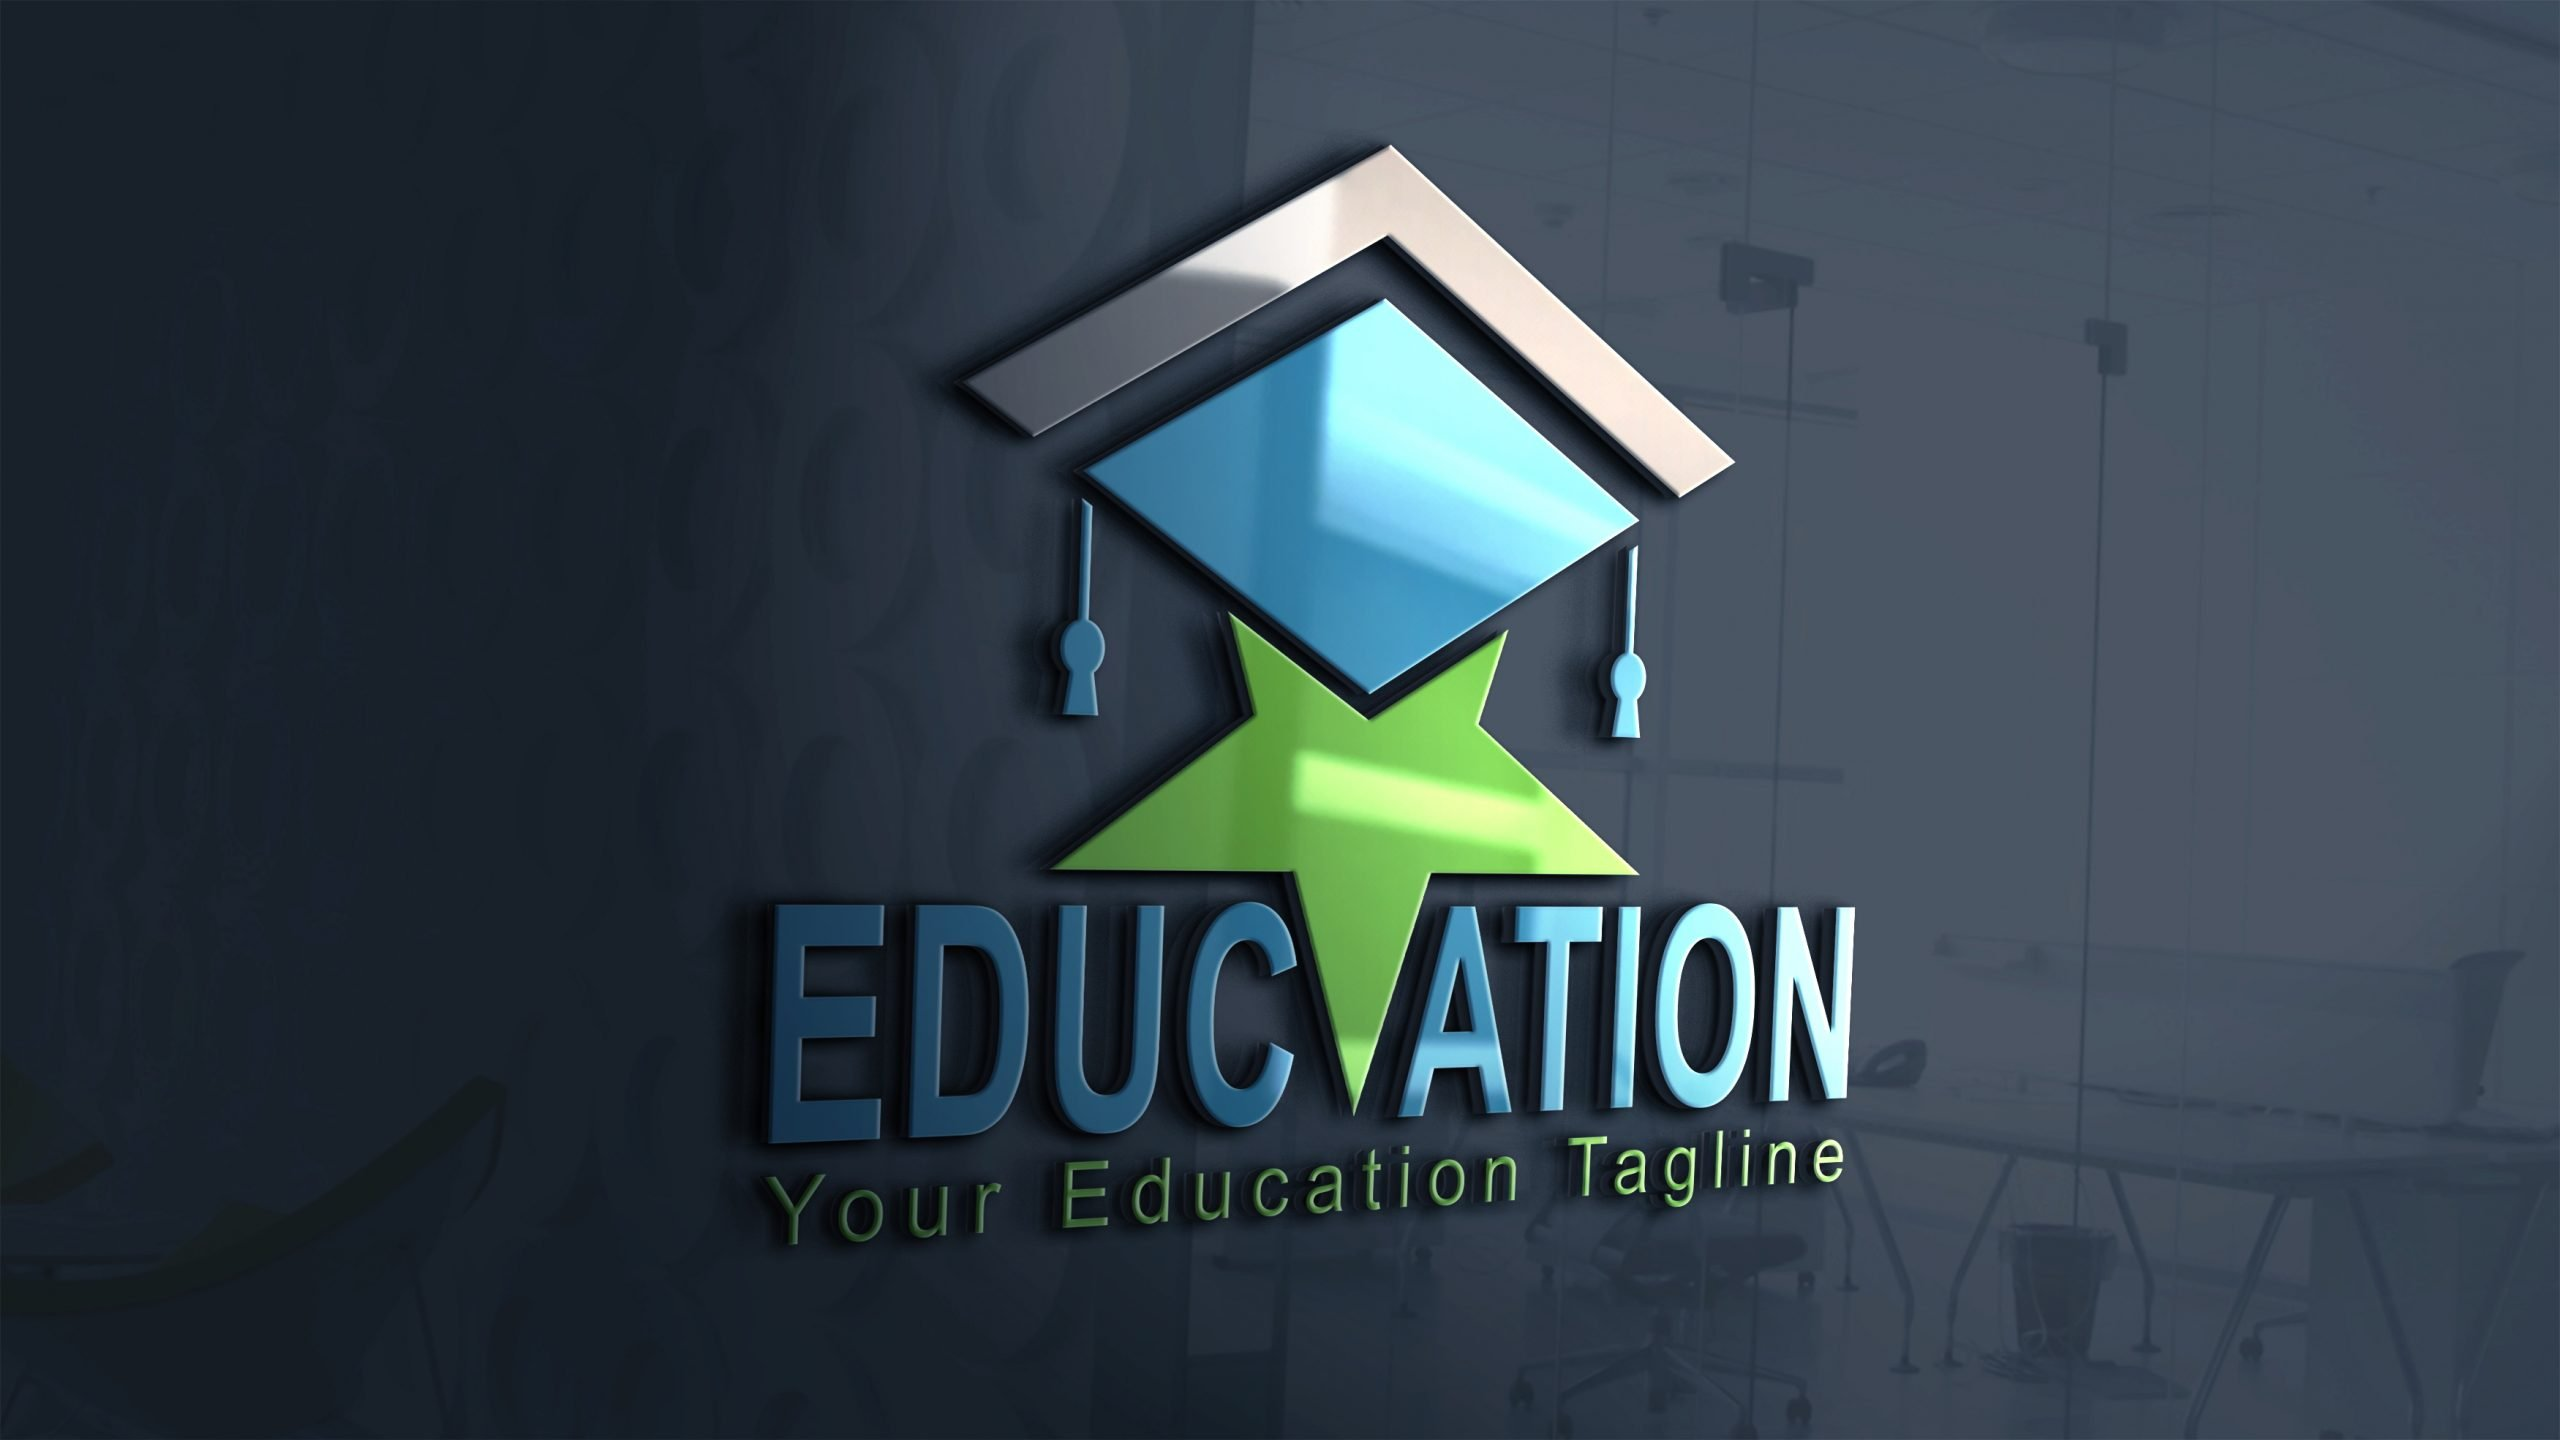 Star education logo design